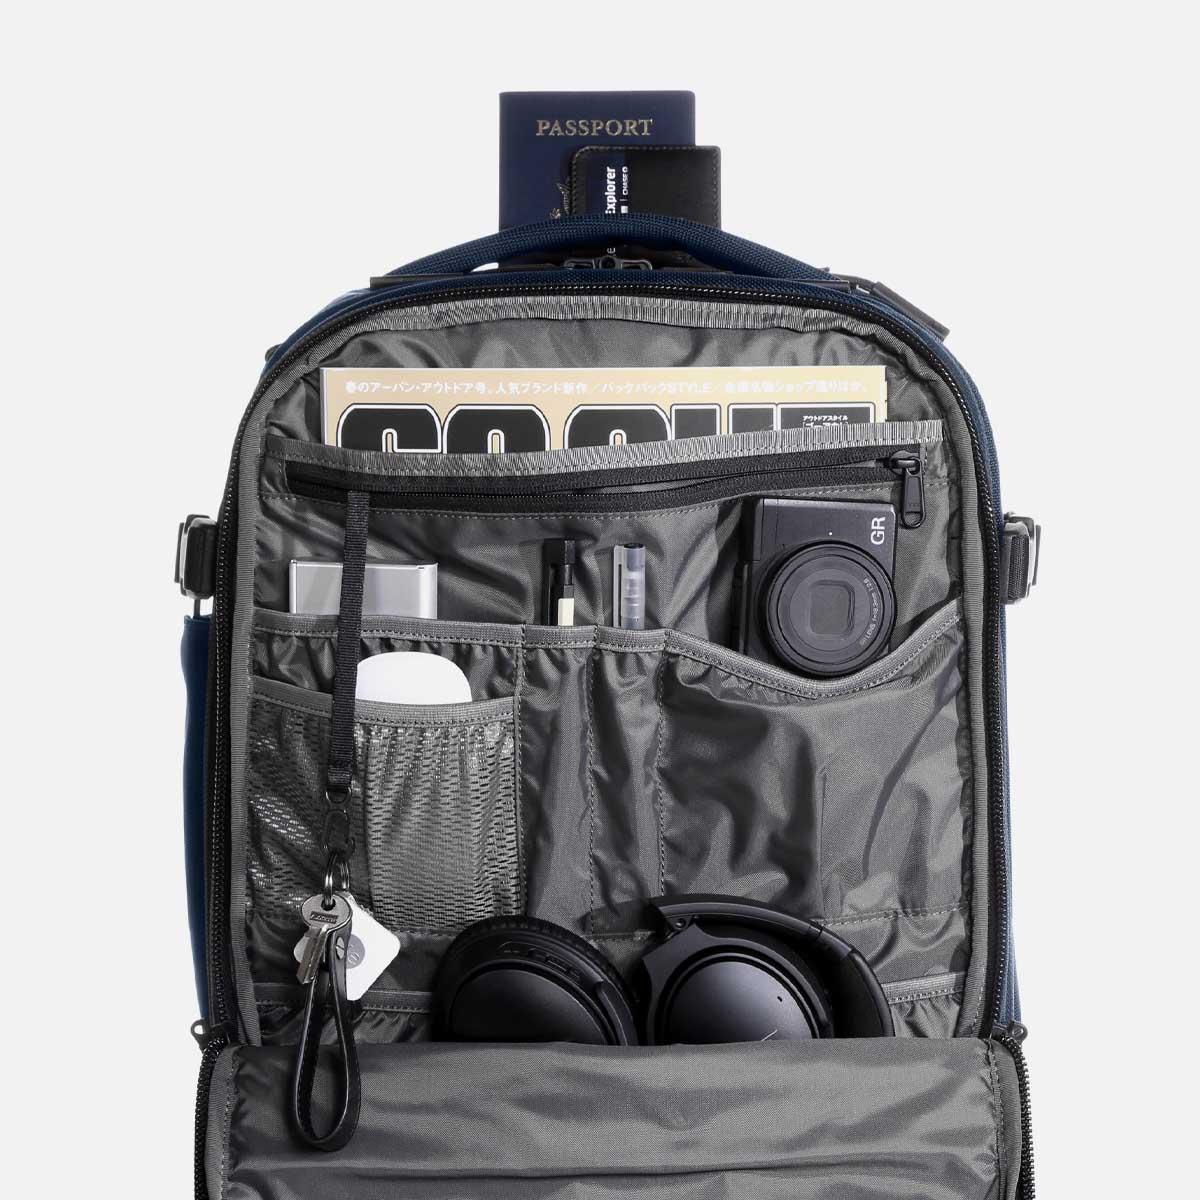 23007_travelpack2_navy_frontorg.jpg